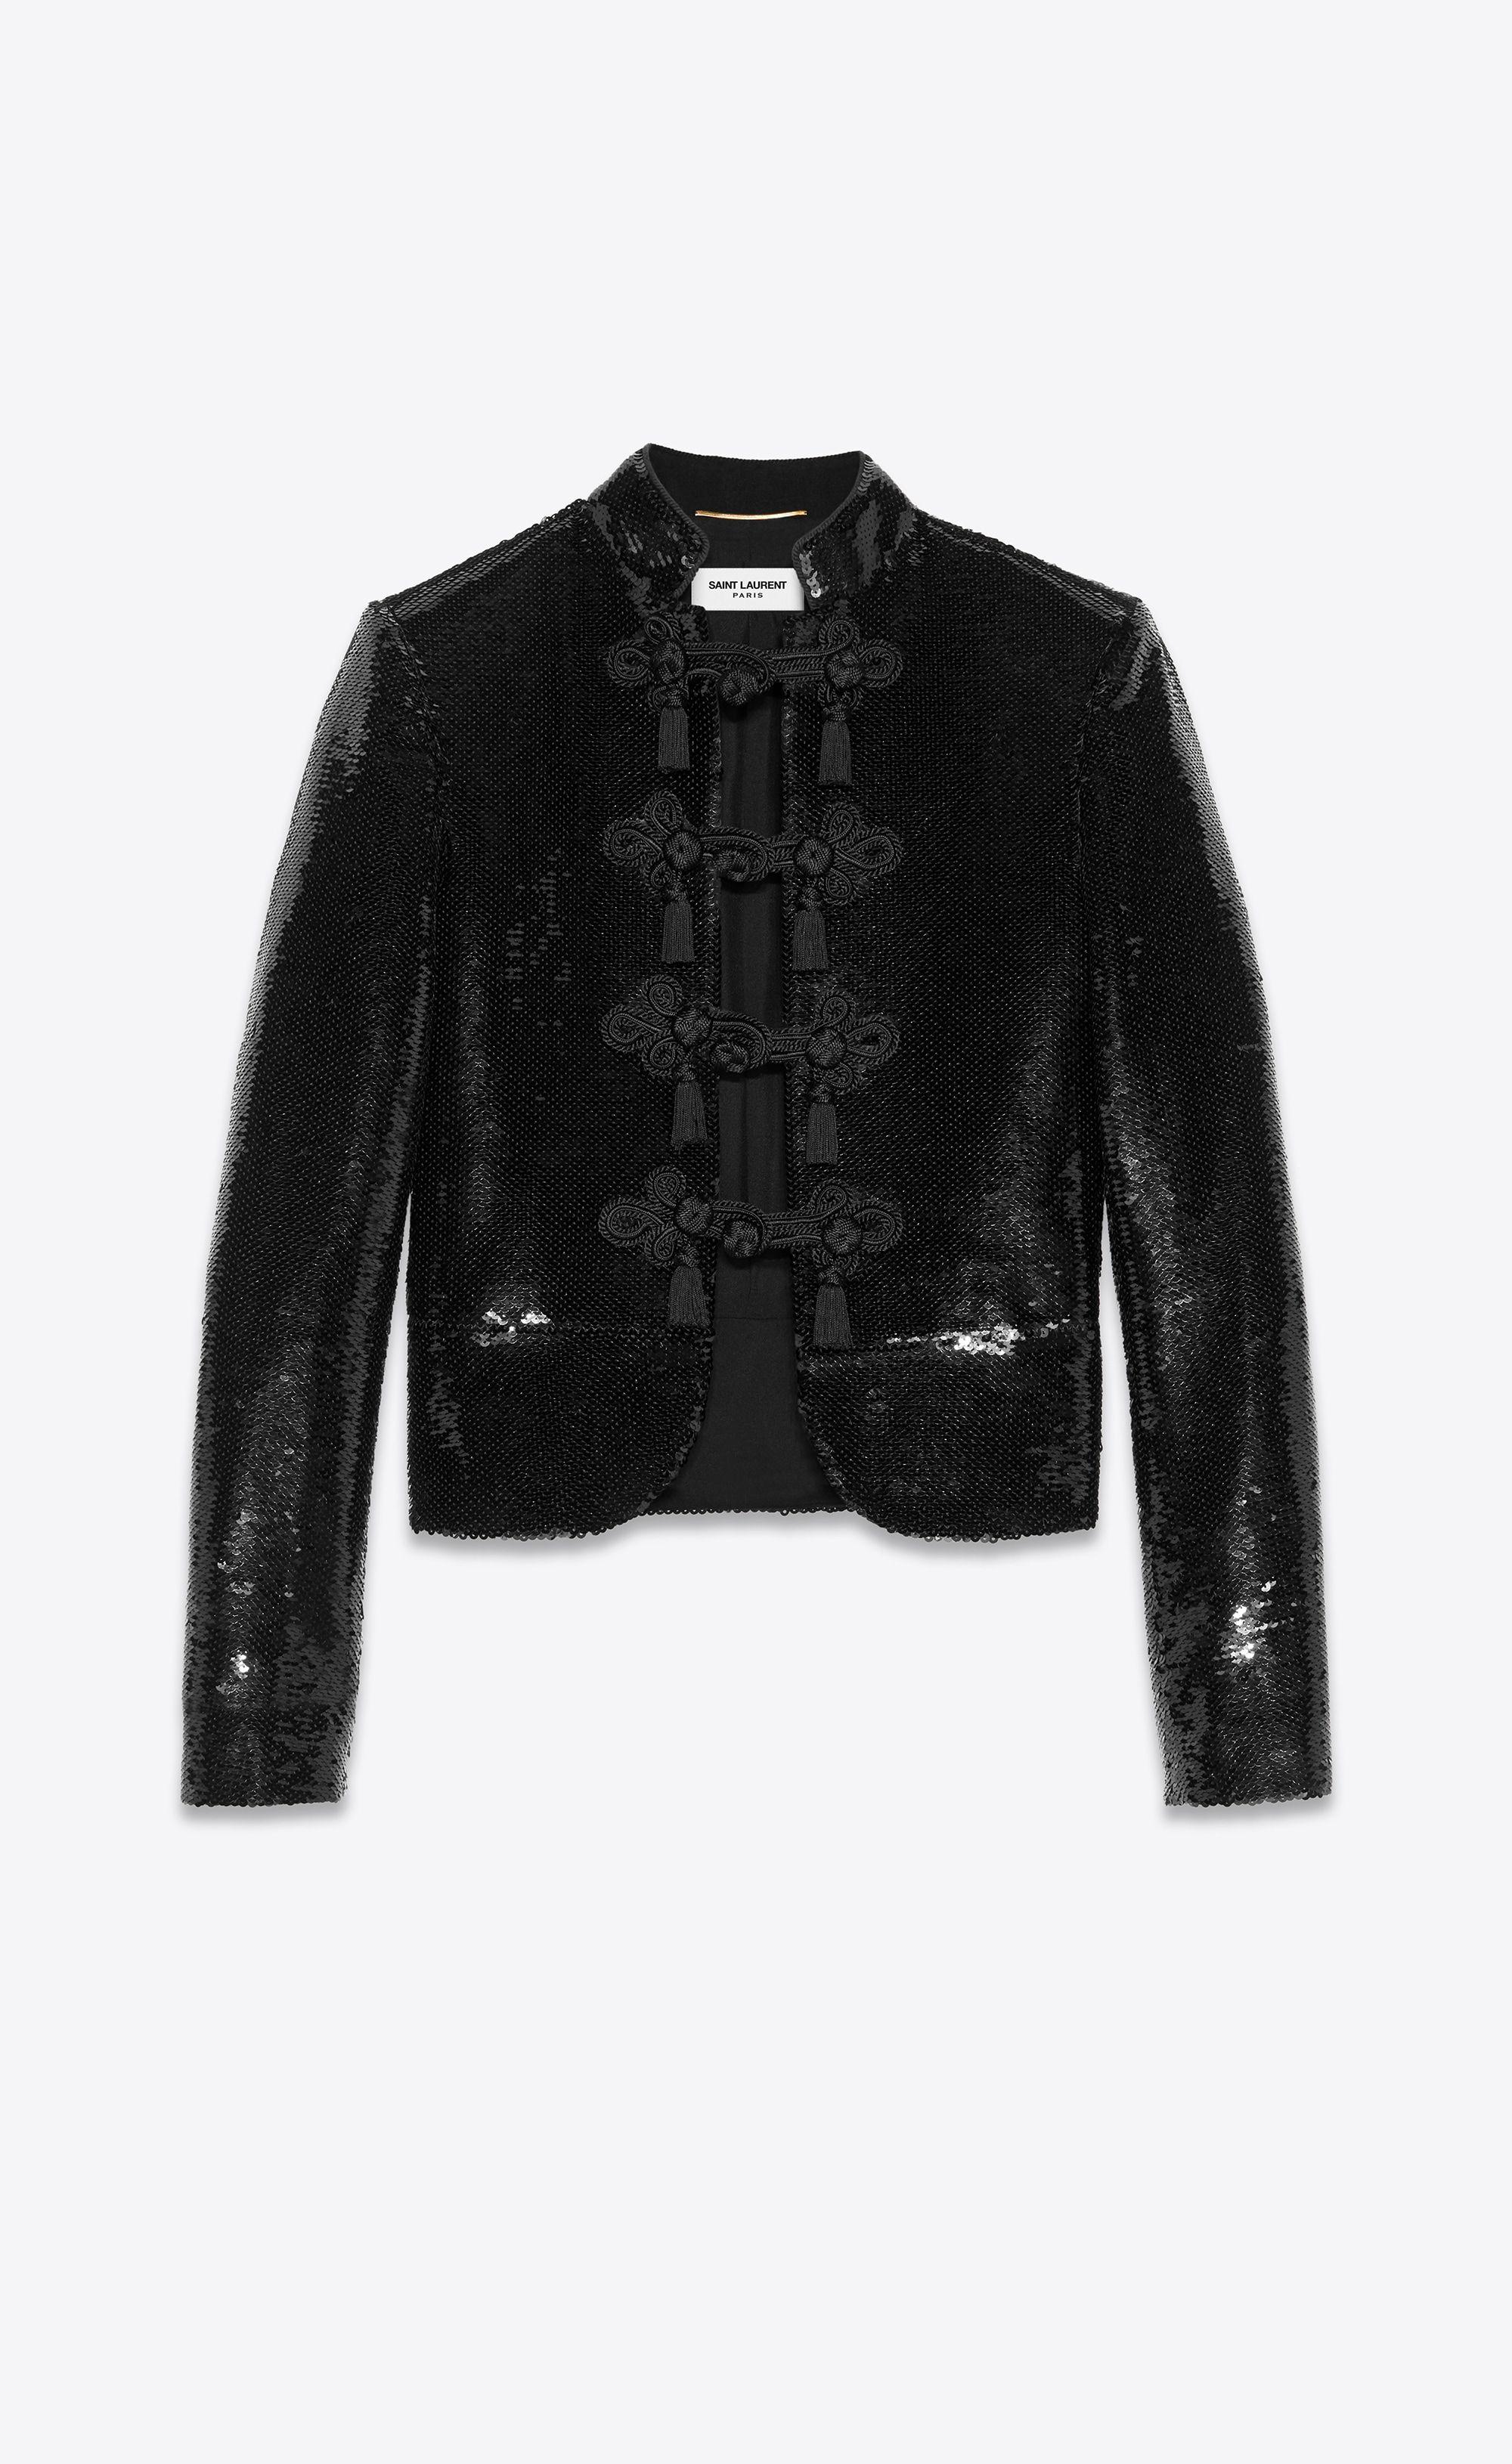 bbf34db9c62 Saint Laurent - All over sequined black jacket ($12,500) | COATS ...